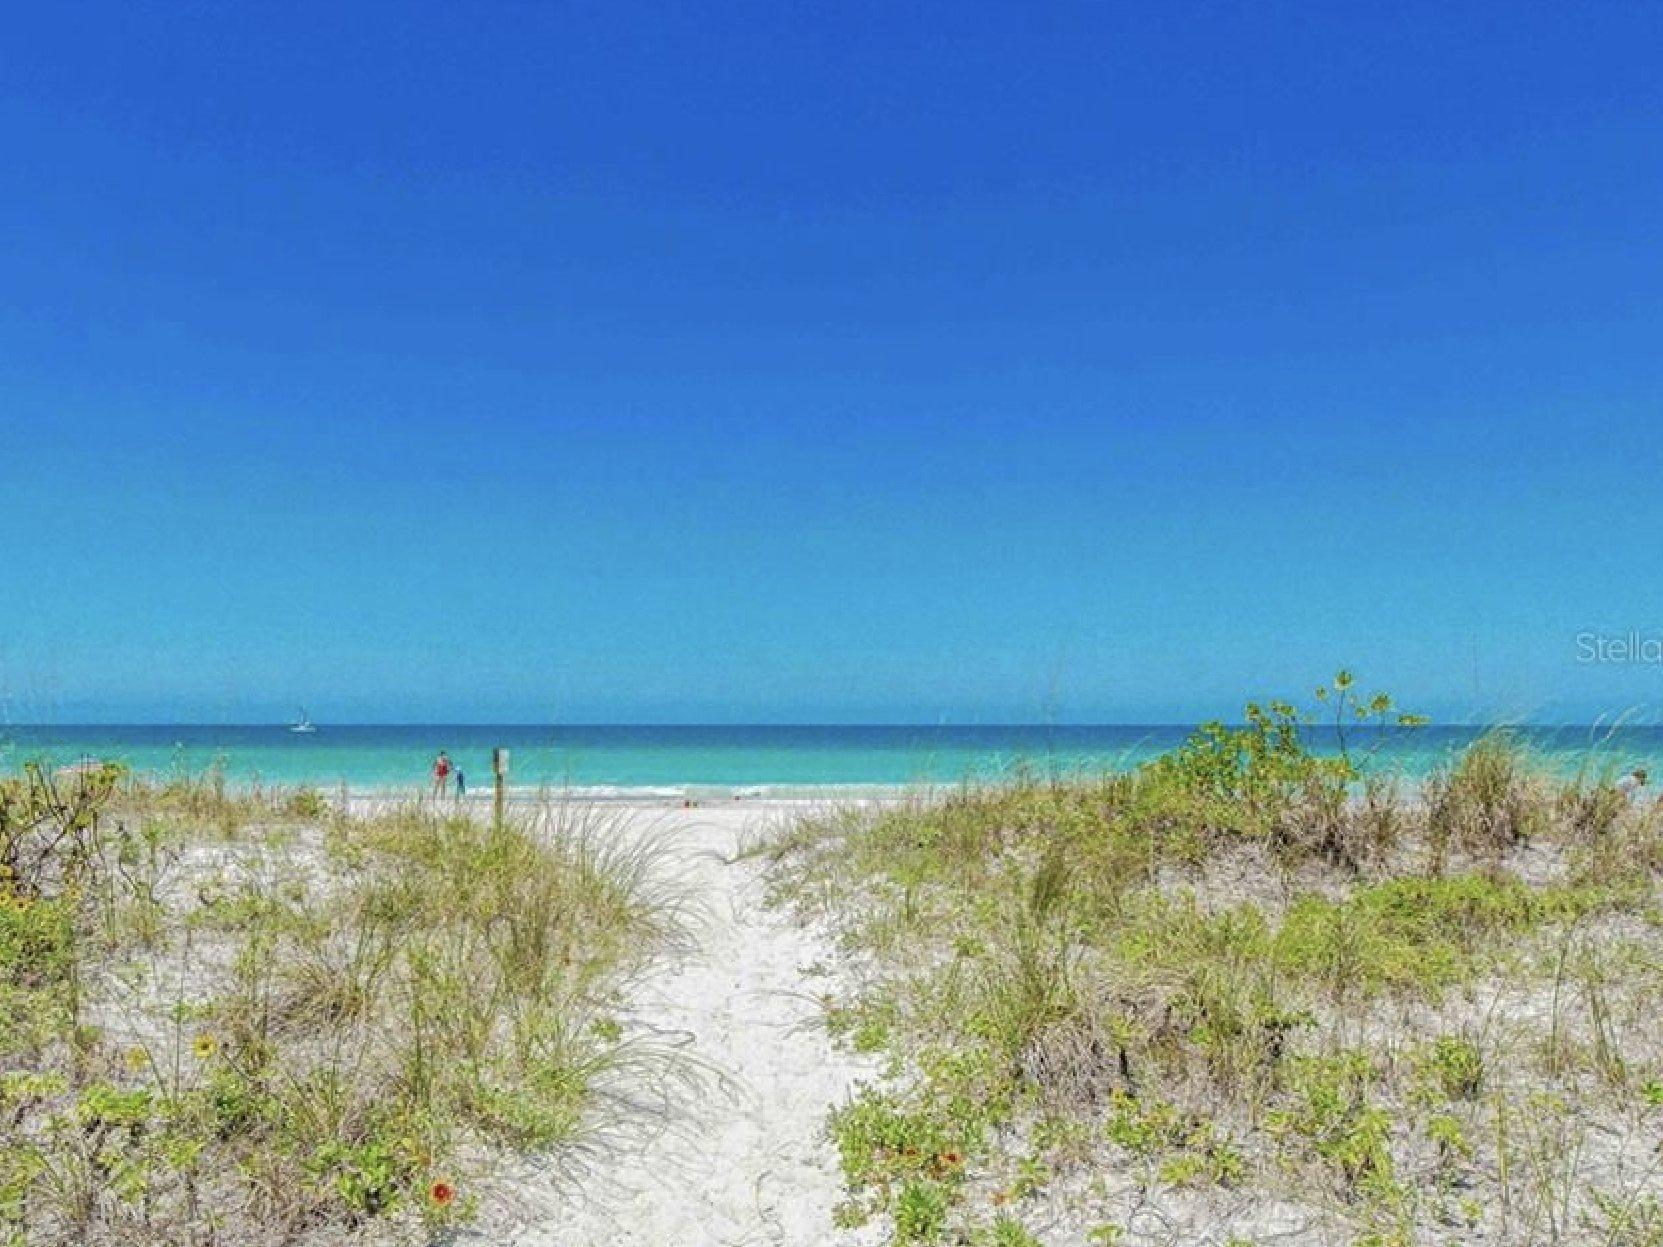 Beach Villa Suite at Carter vacation Rentals